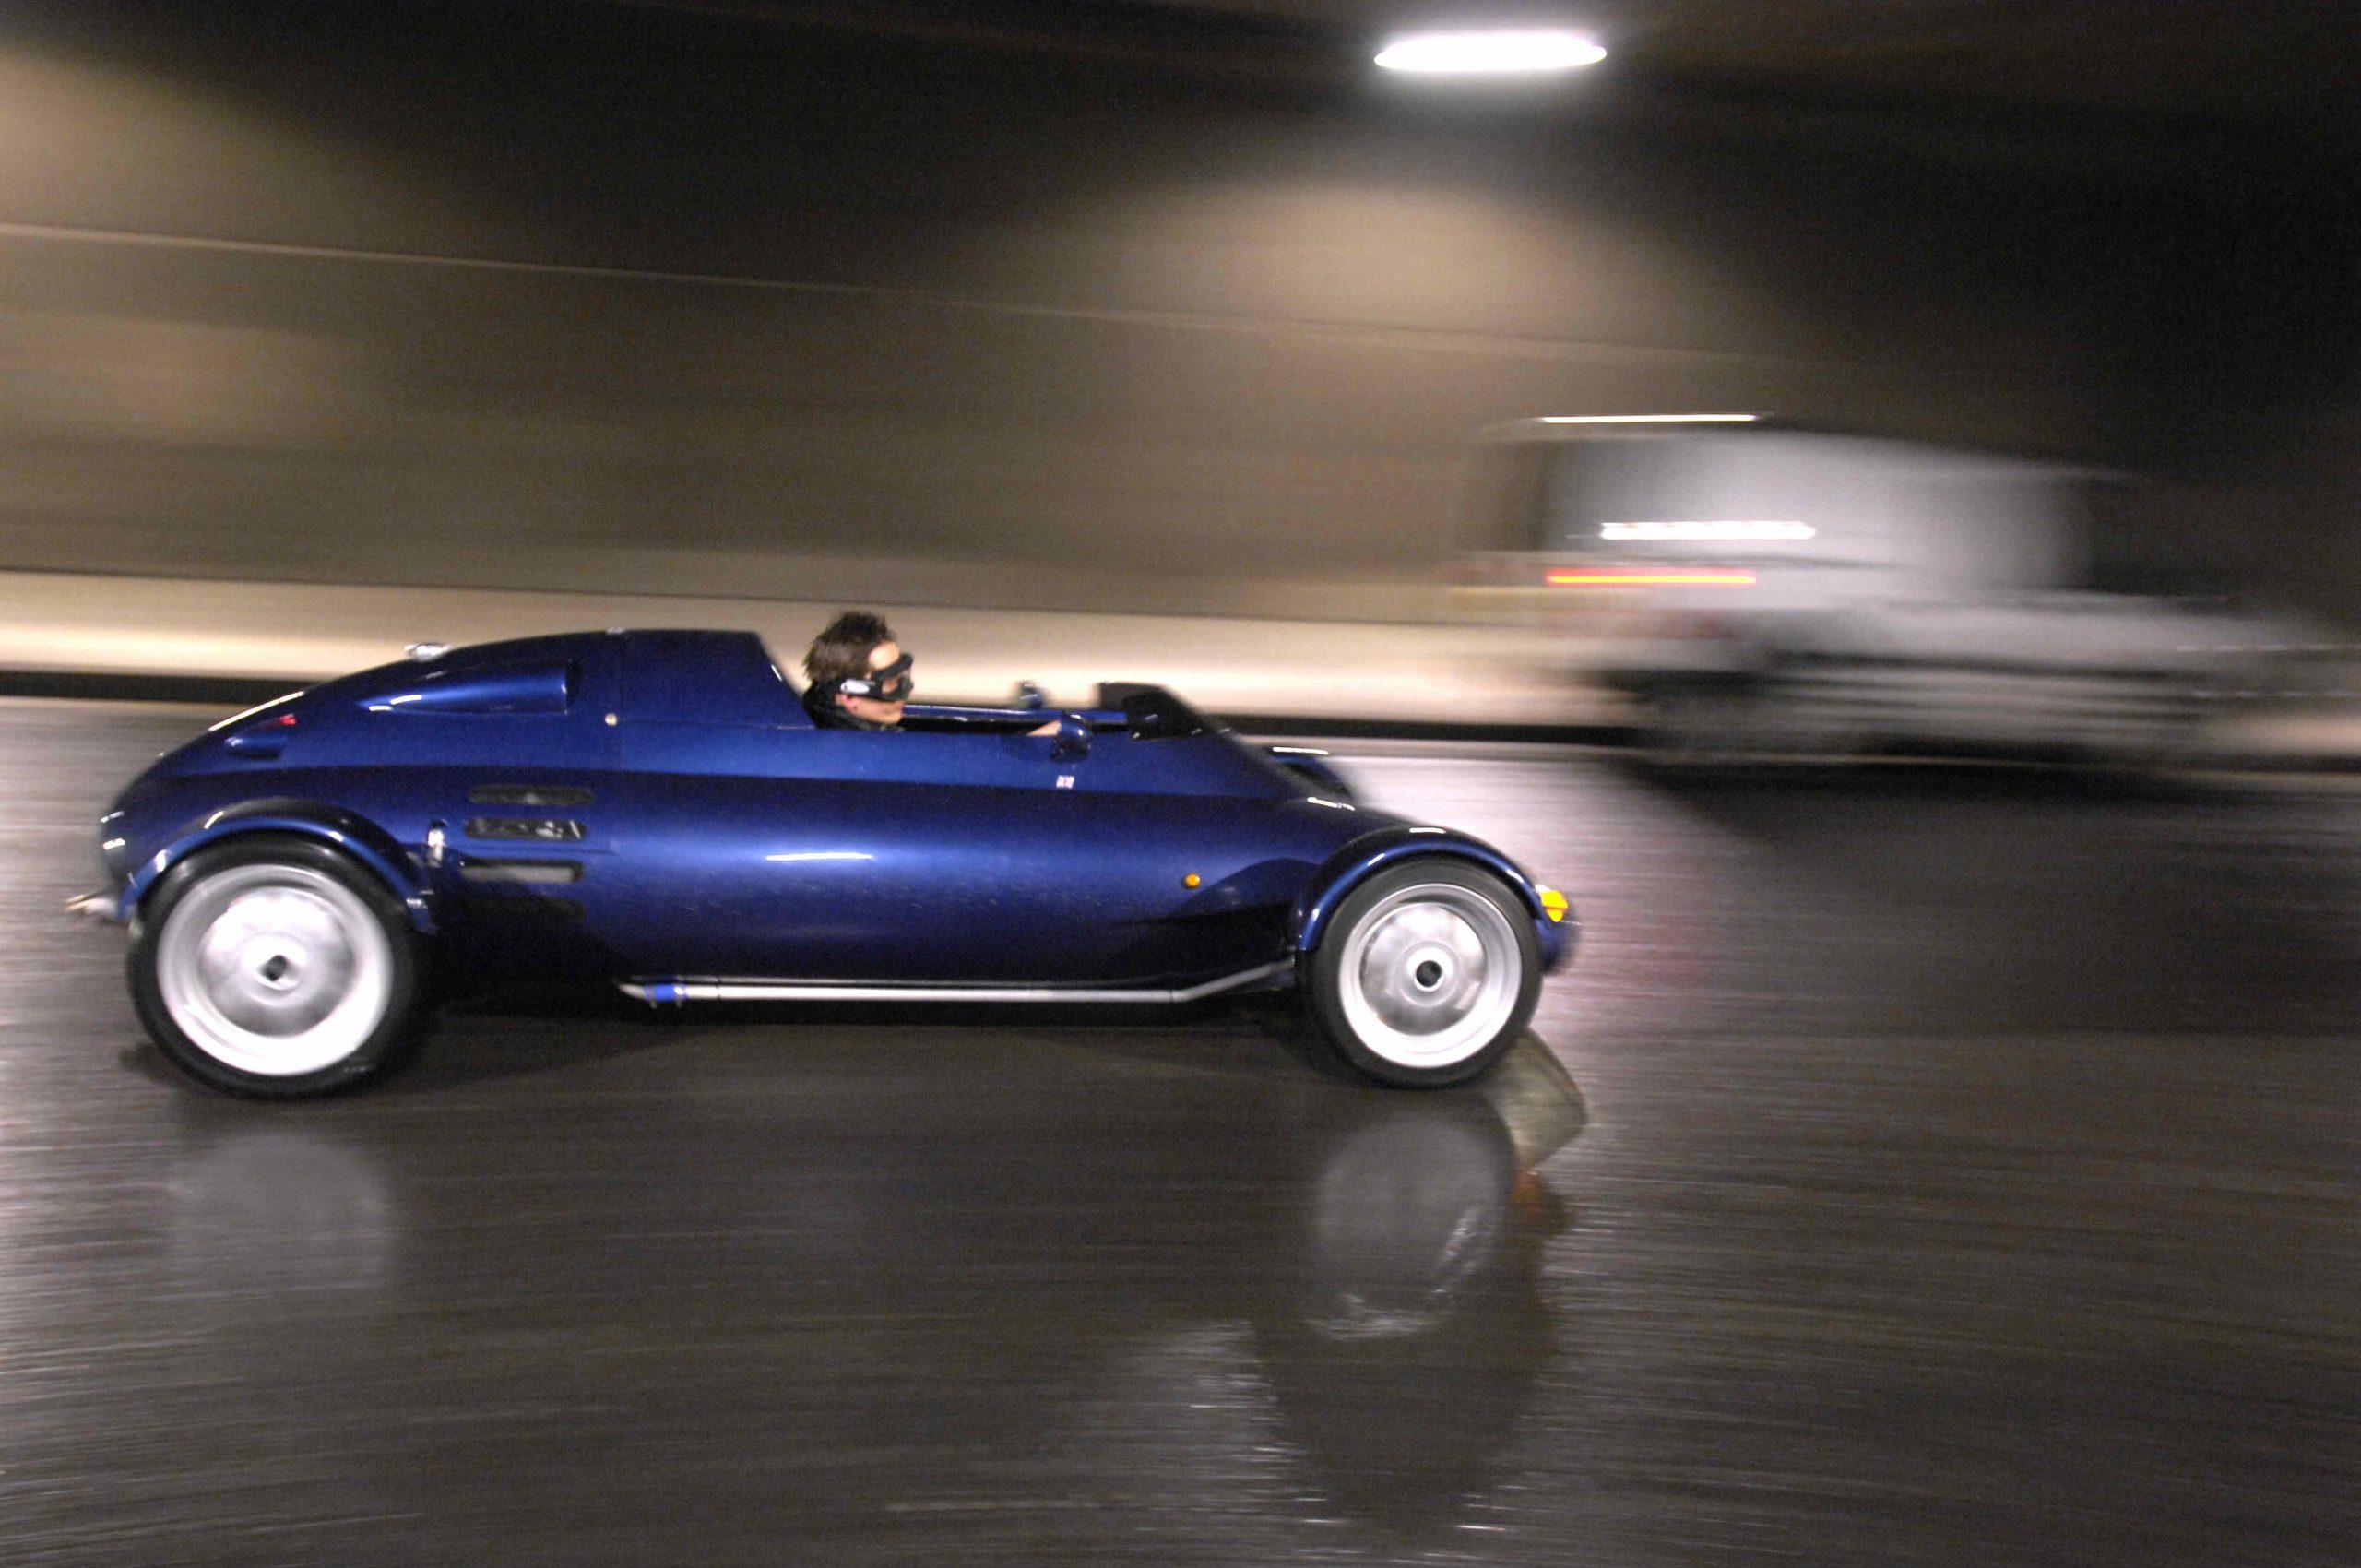 Rocket car side profile dynamic road action